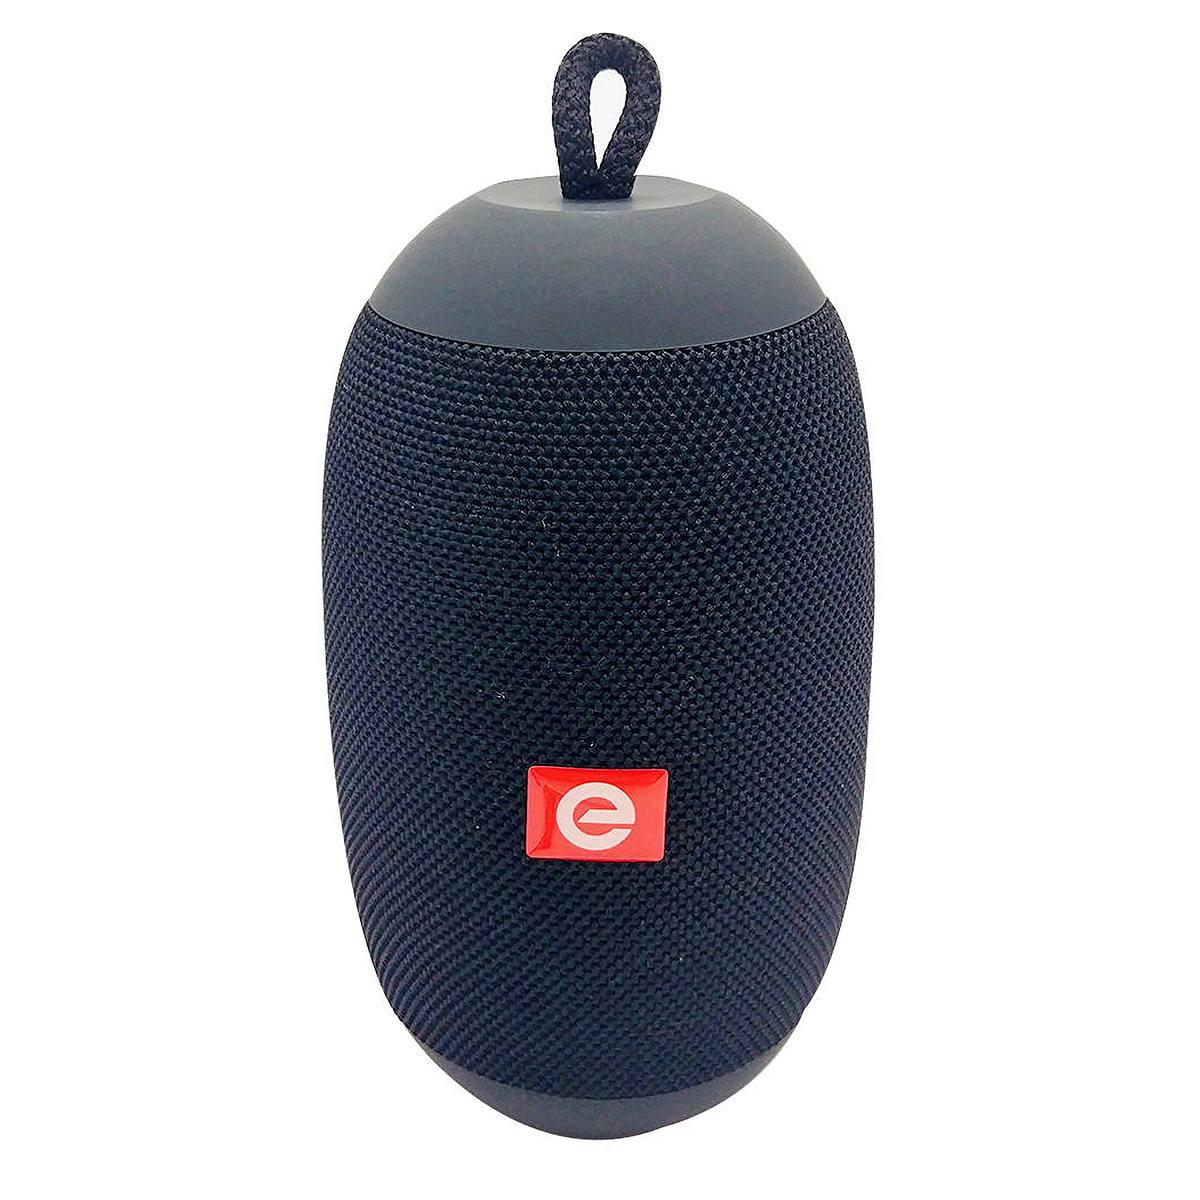 Caixa Bluetooth Oval Speaker com TWS USB SD Rádio FM 6W Microfone Exbom CS-M50BT Preta